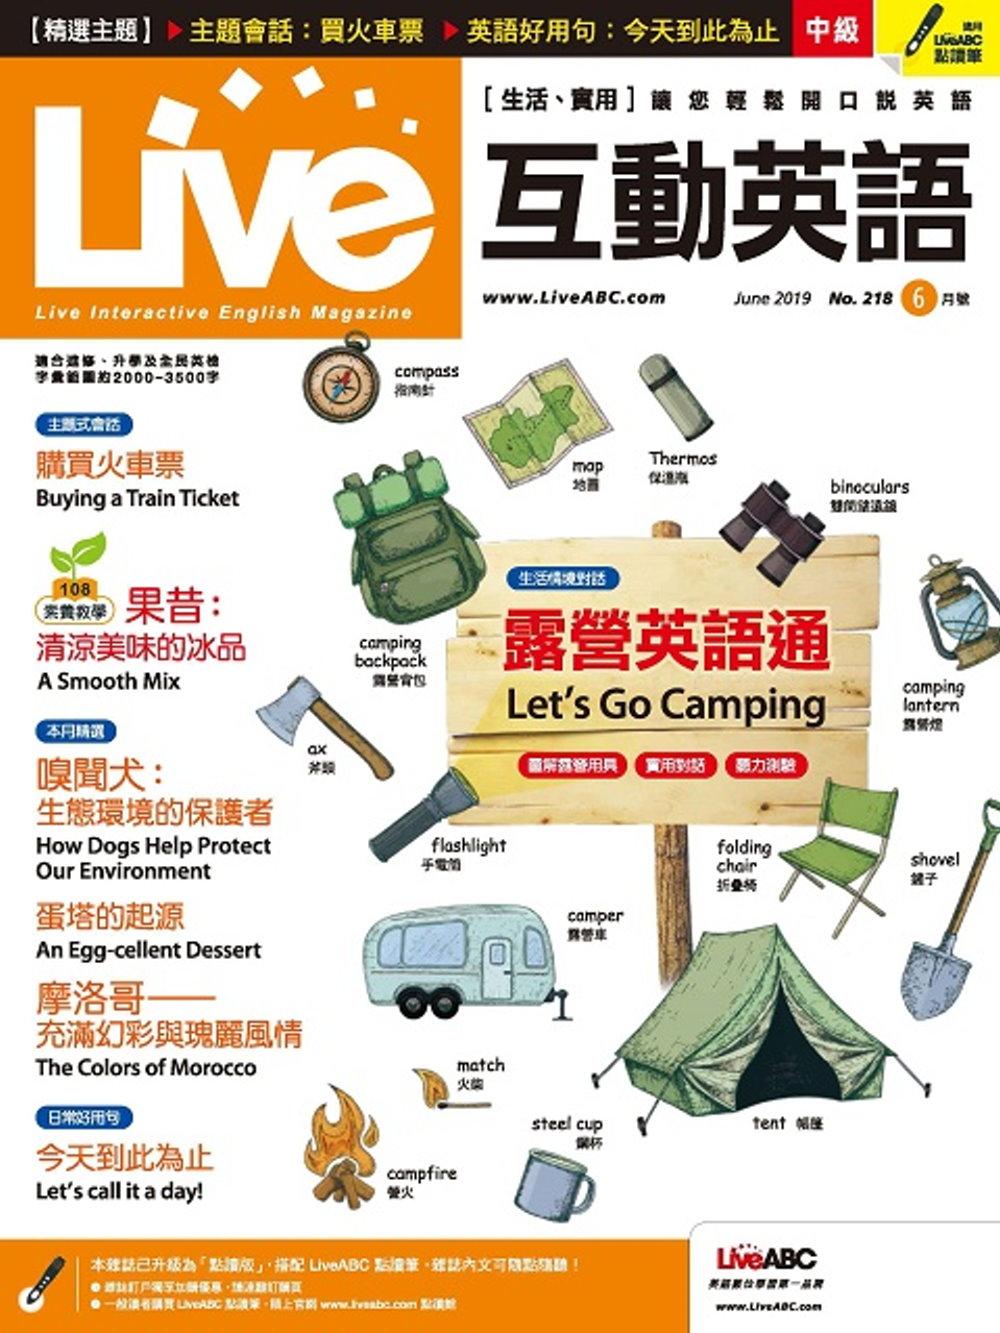 Live互動英語(互動光碟版)二年24期+5期+每天5分鐘學口語(口袋書)